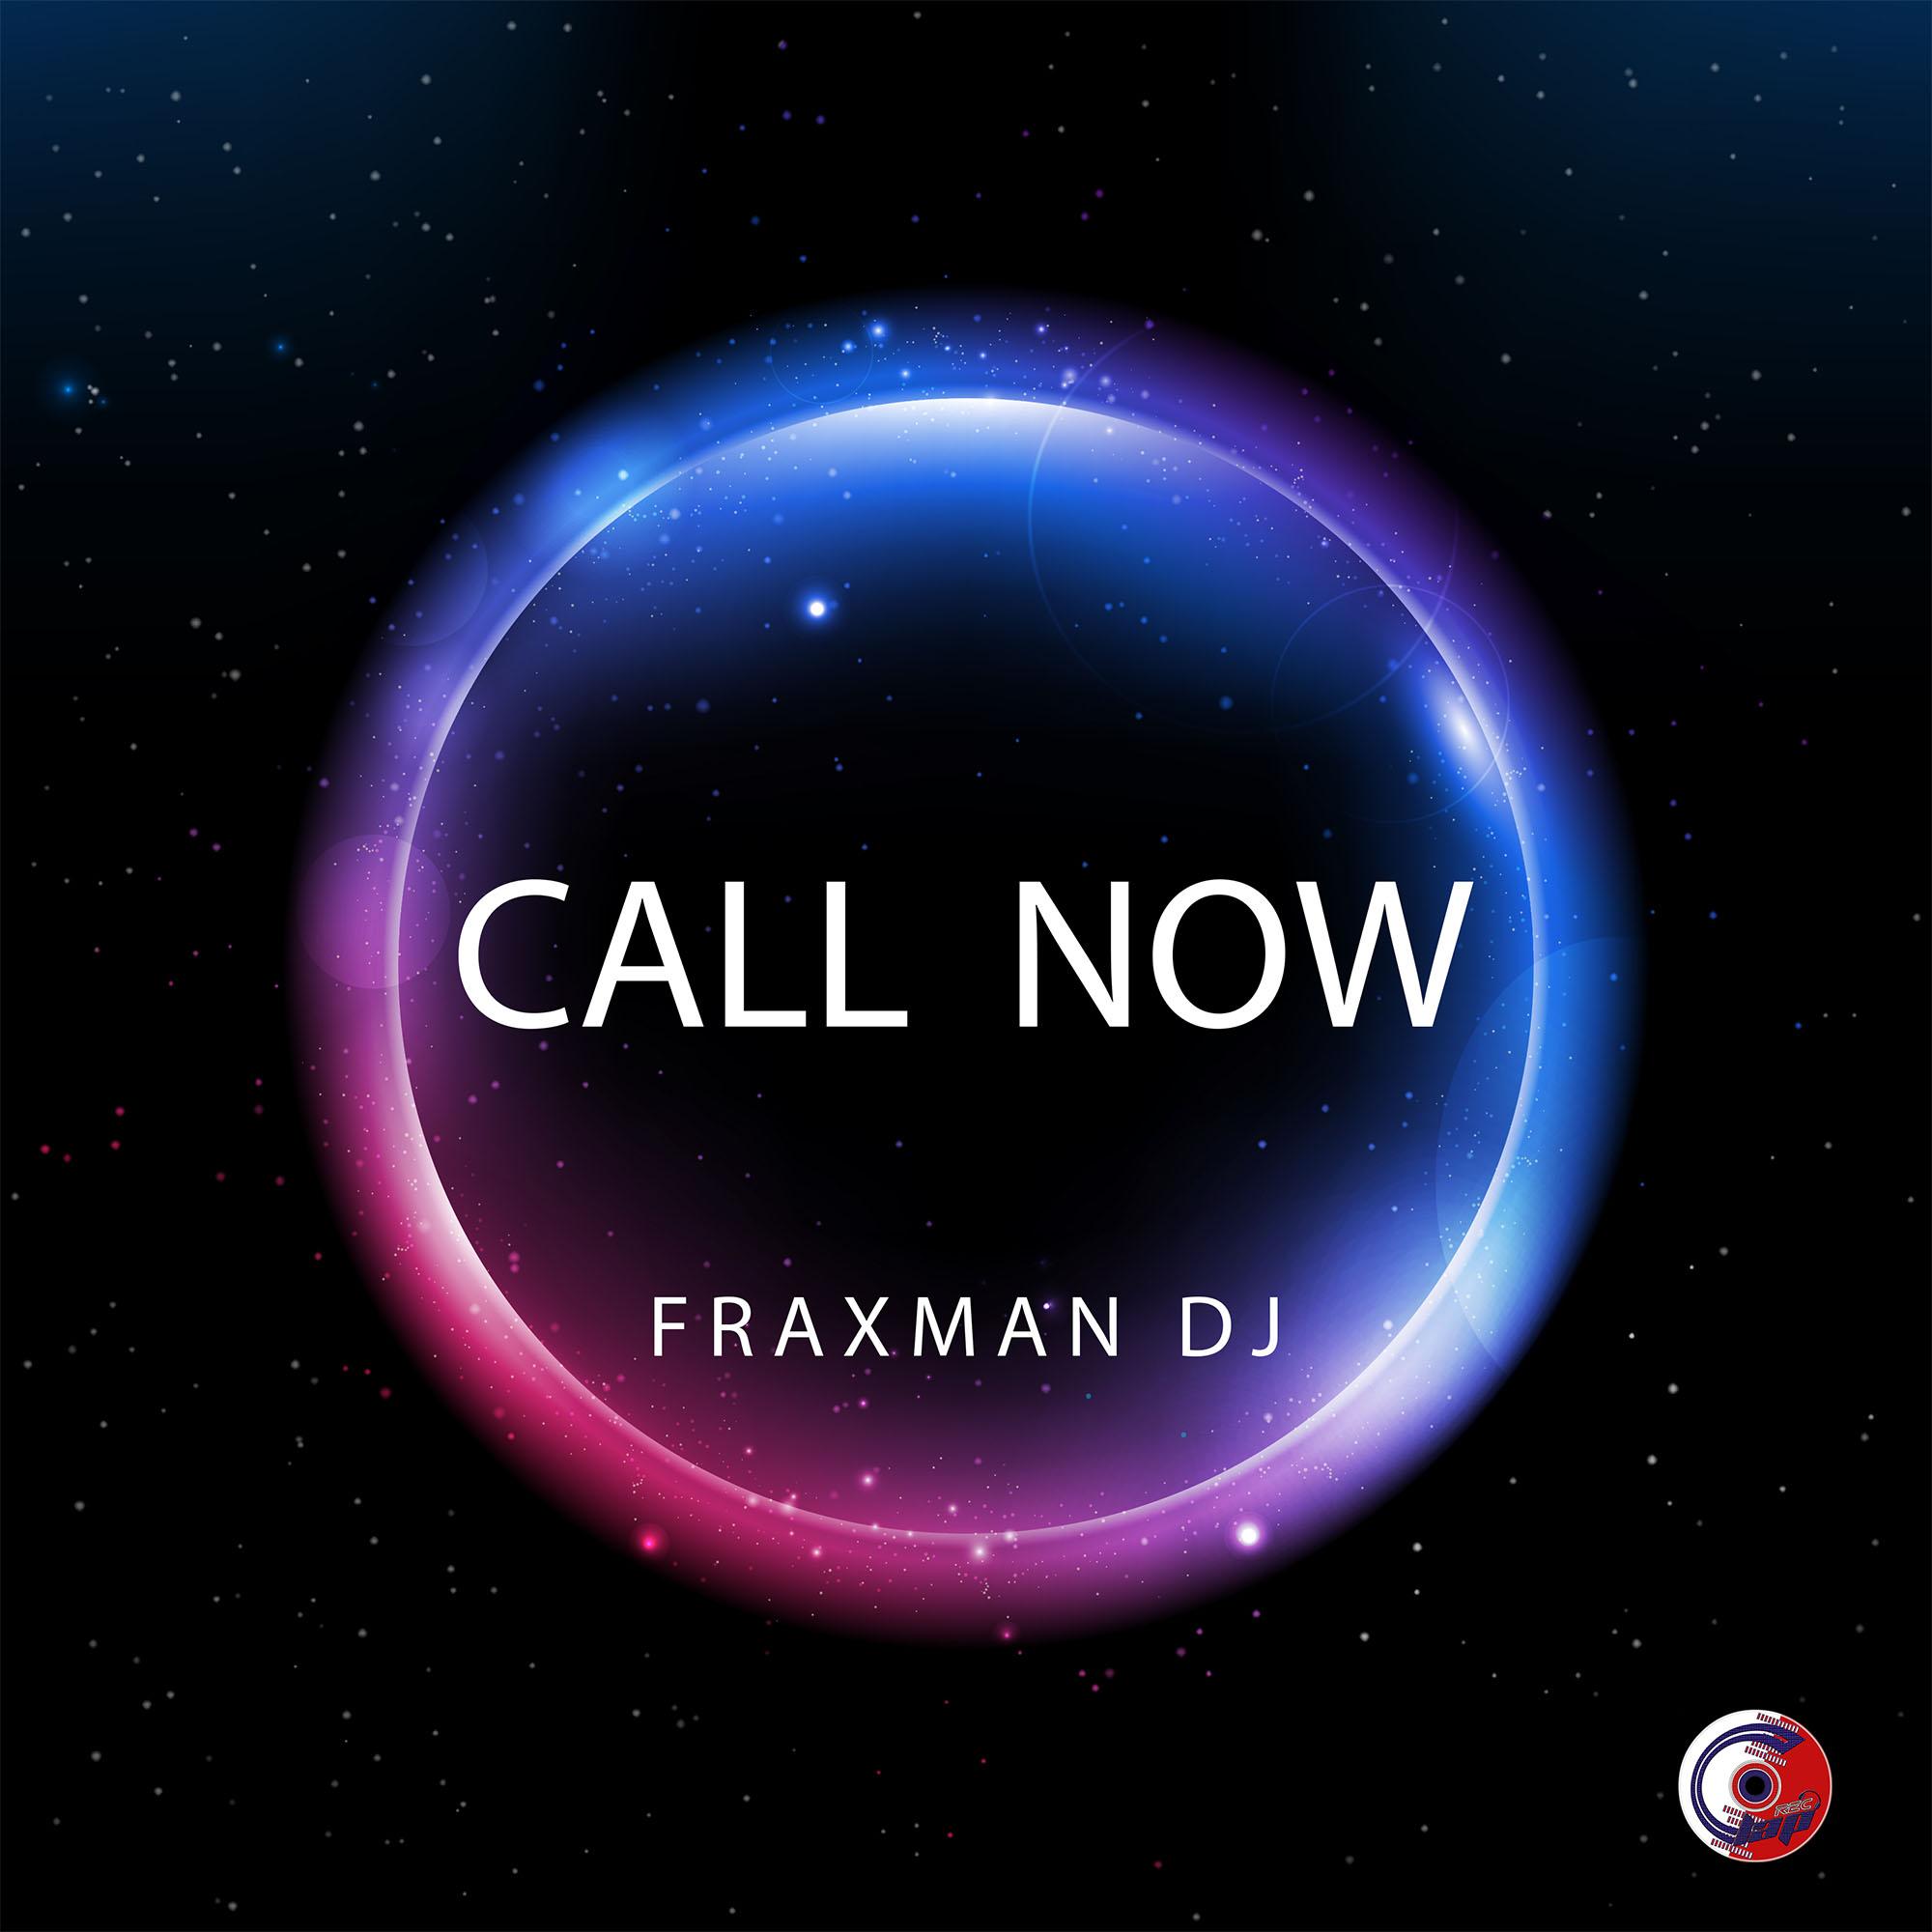 FRAXMAN DJ-Call Now